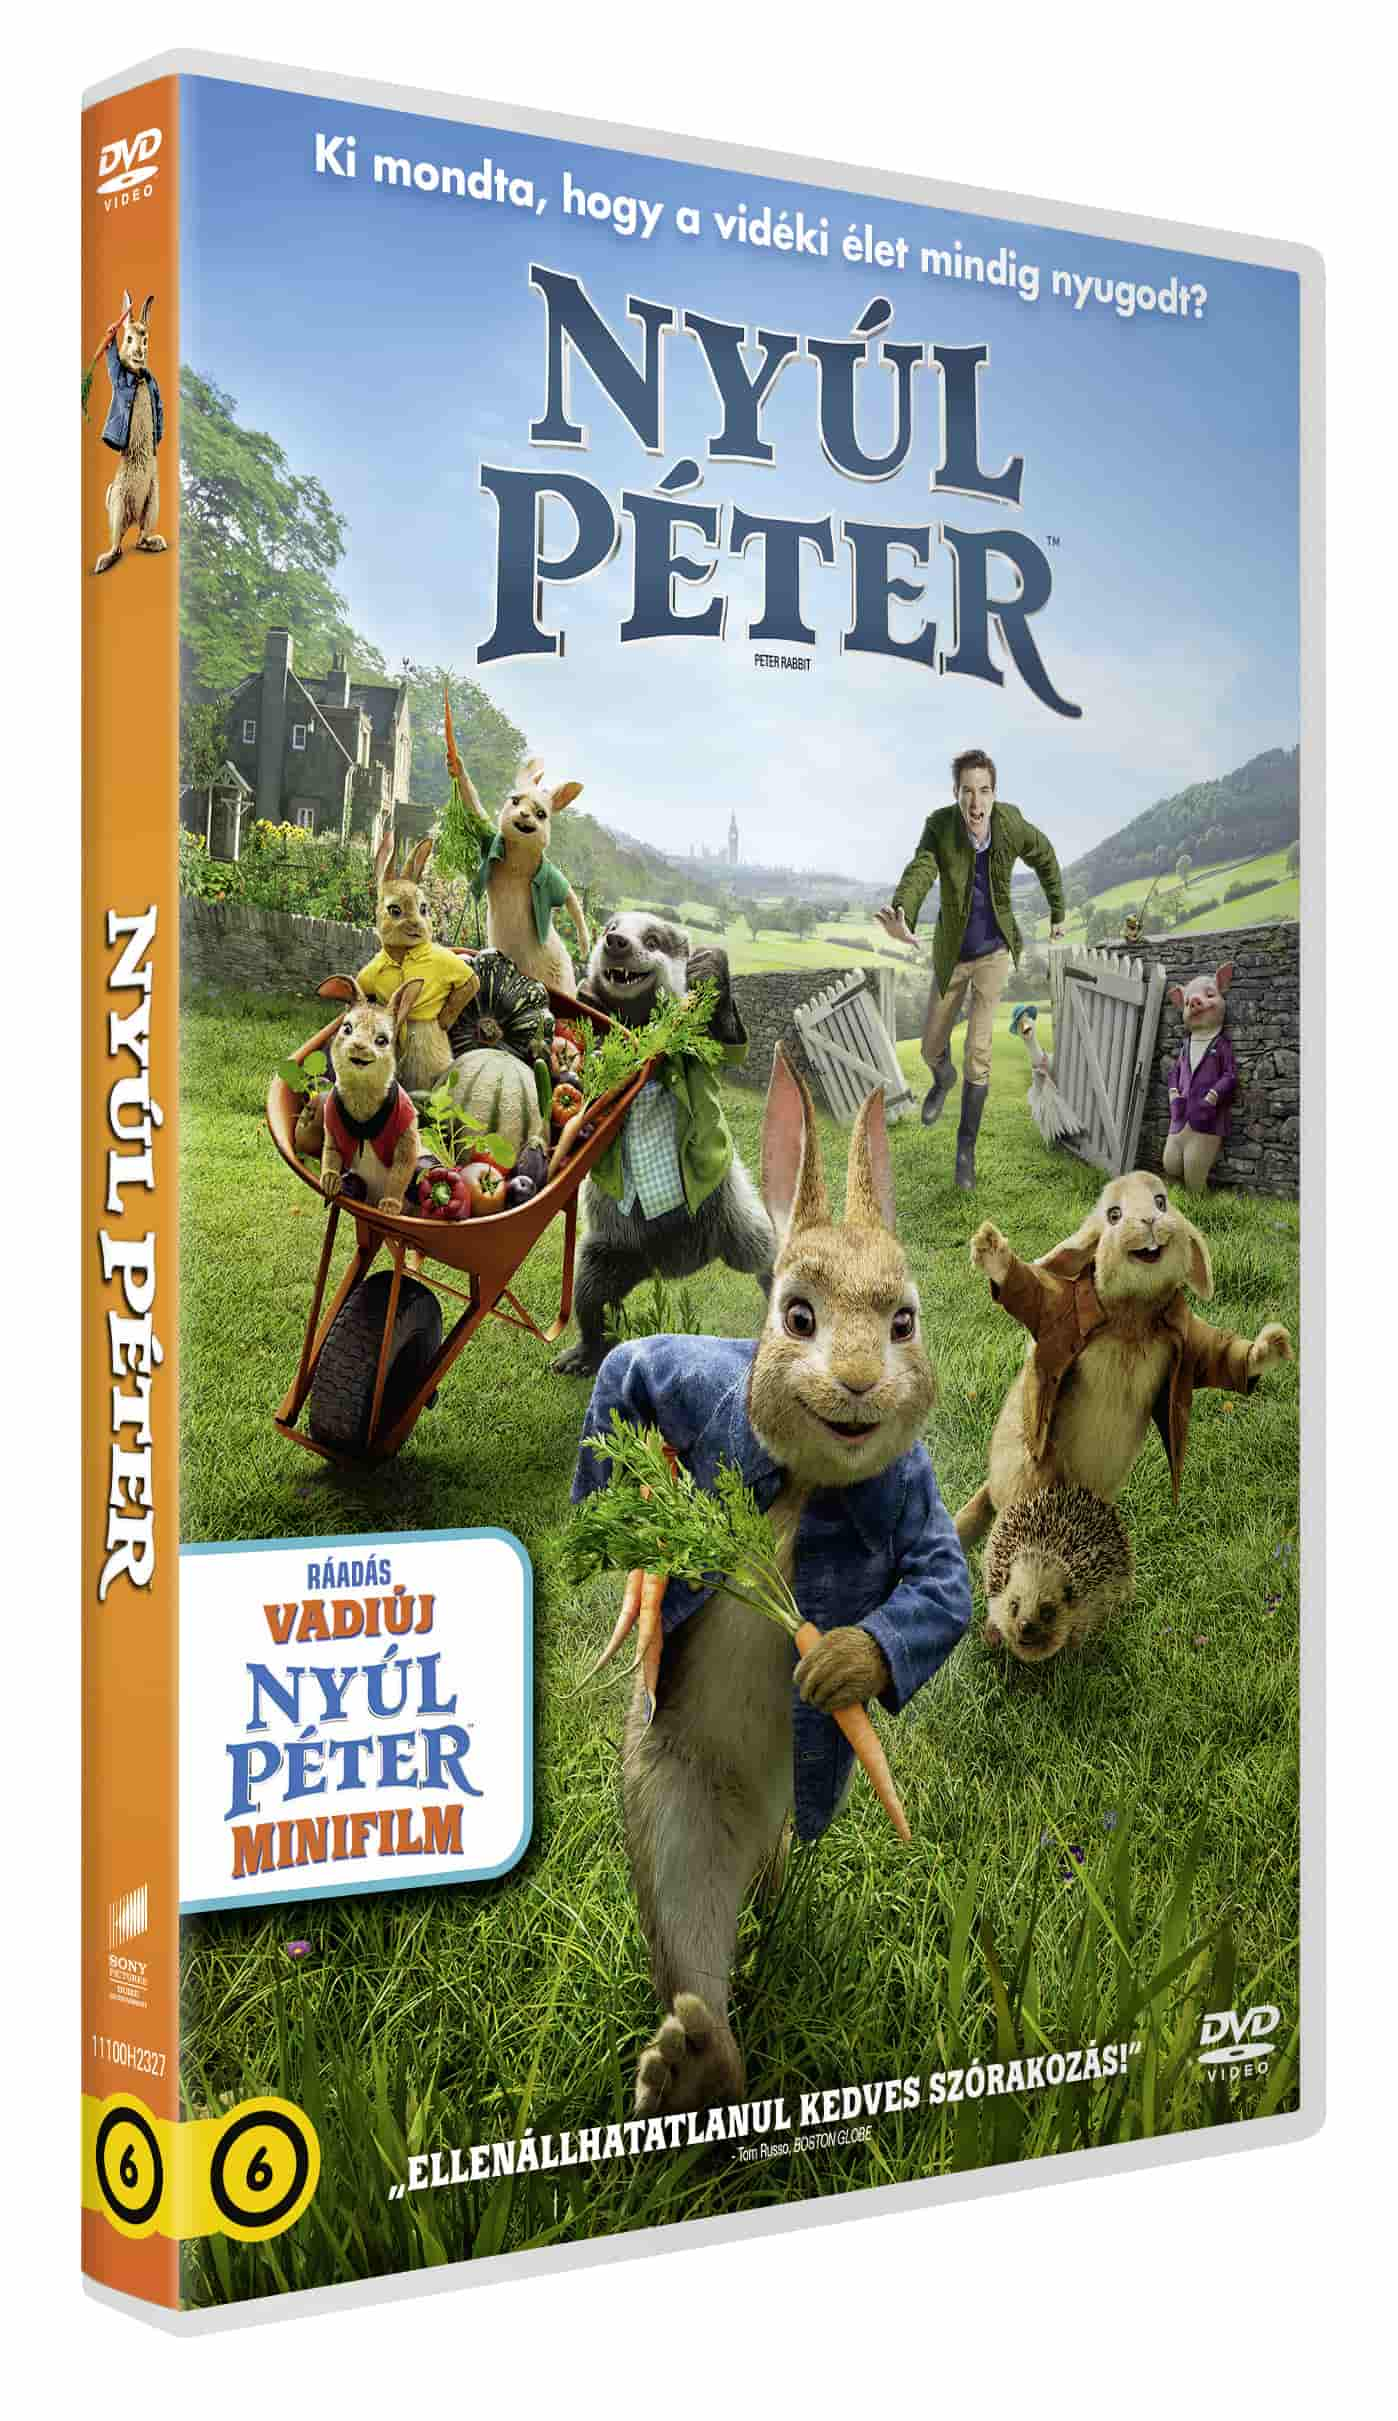 Nyúl Péter - DVD